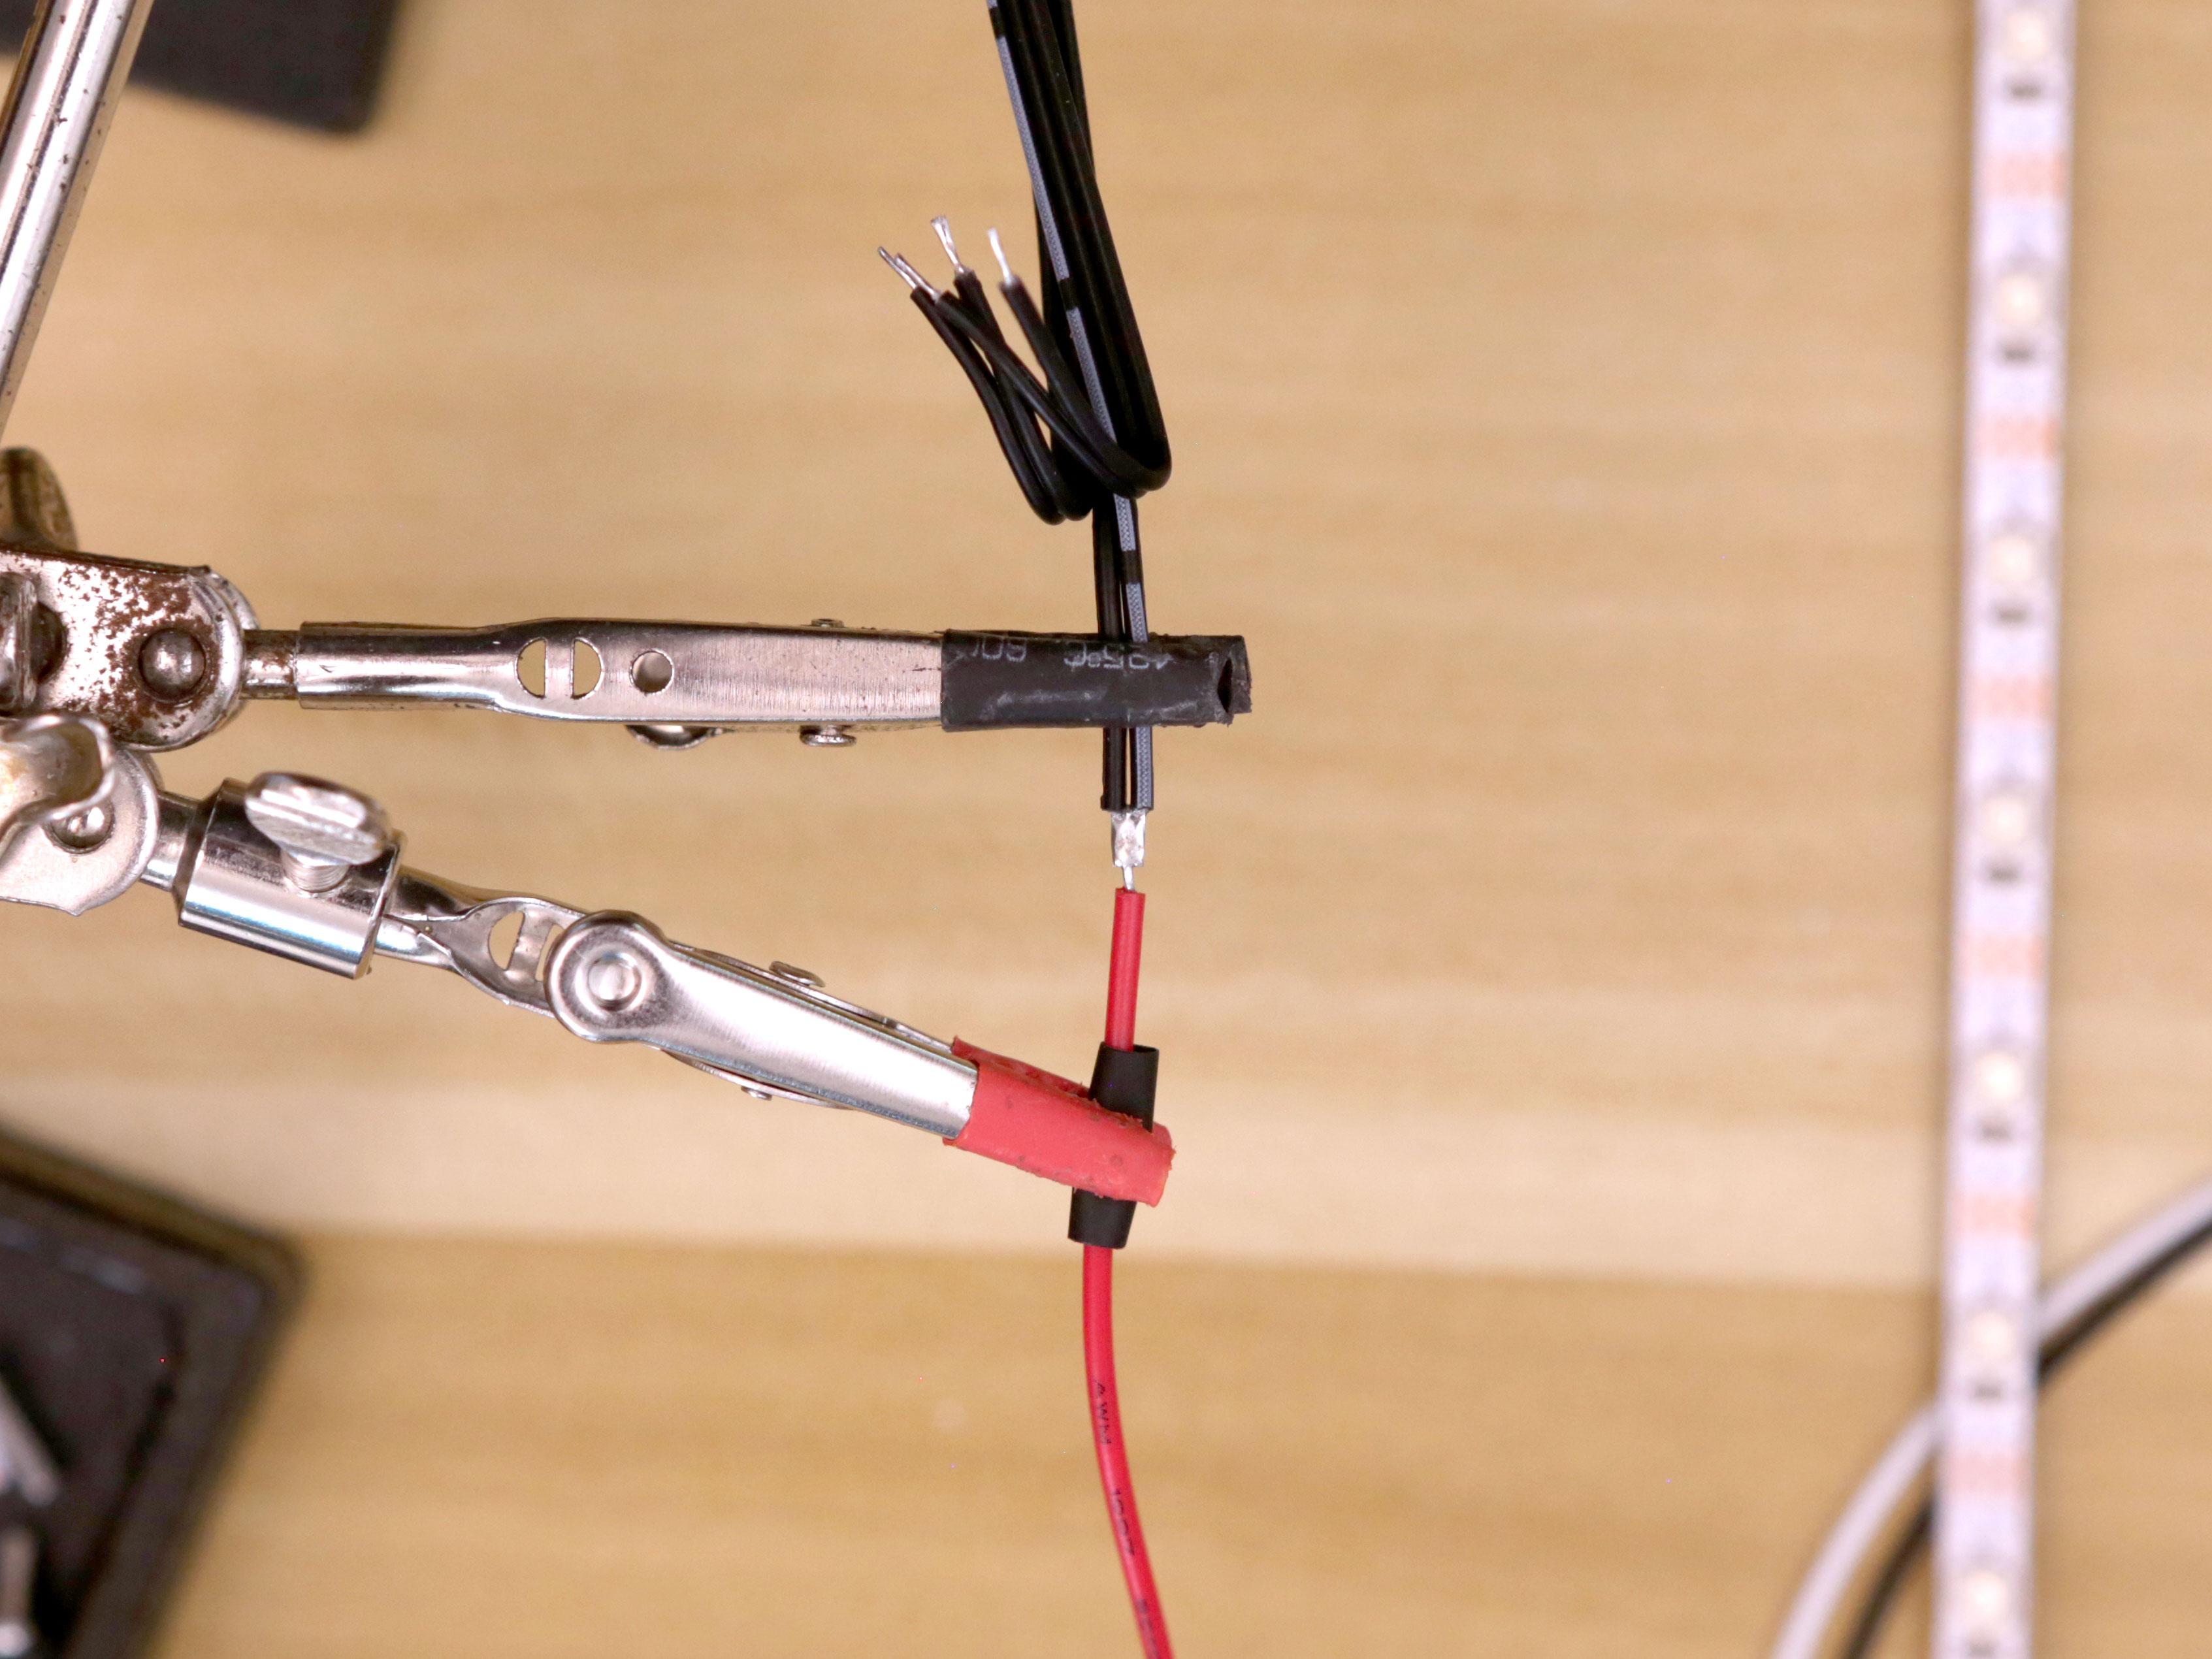 3d_printing_strip-vcc-wire.jpg